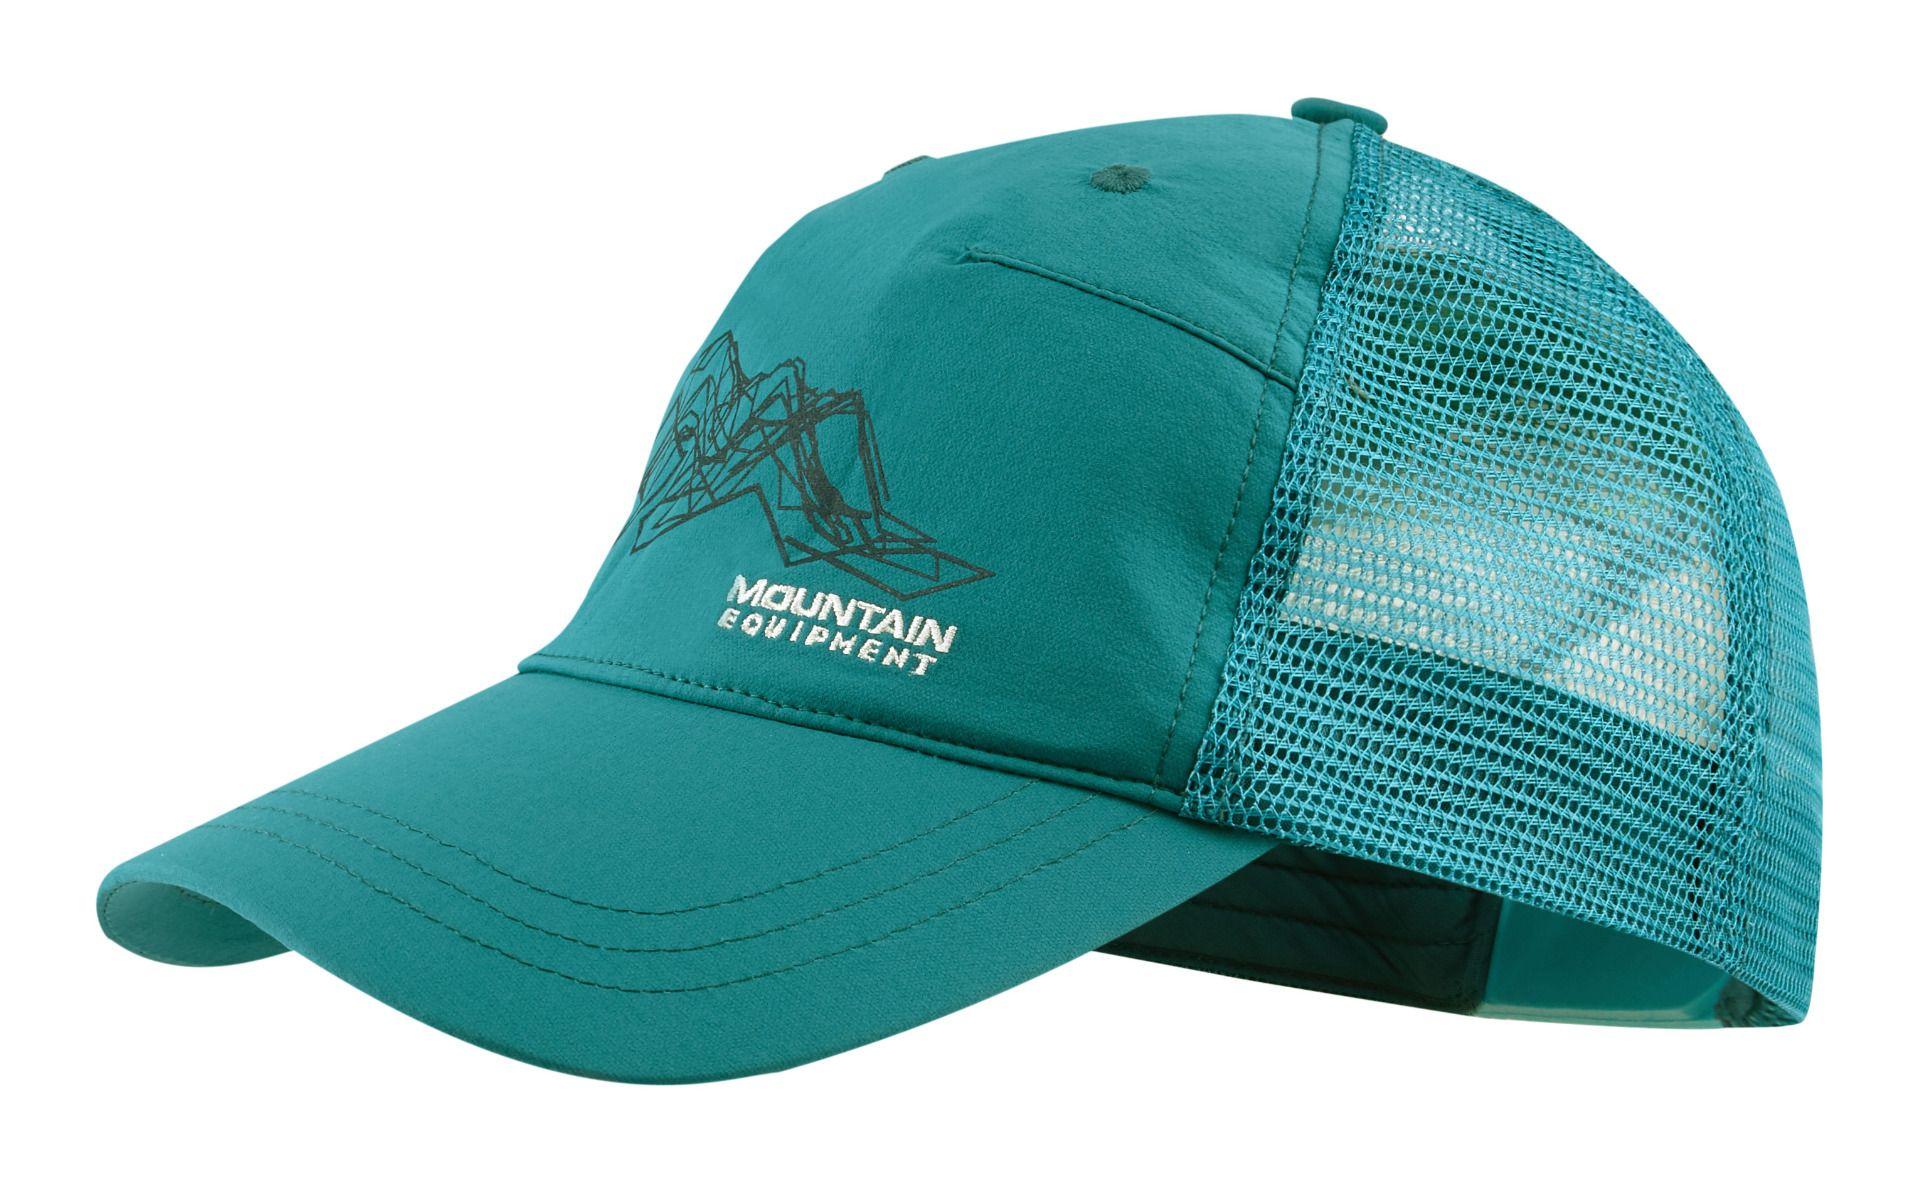 Кепка Mountain Equipment V13 Cap зеленая